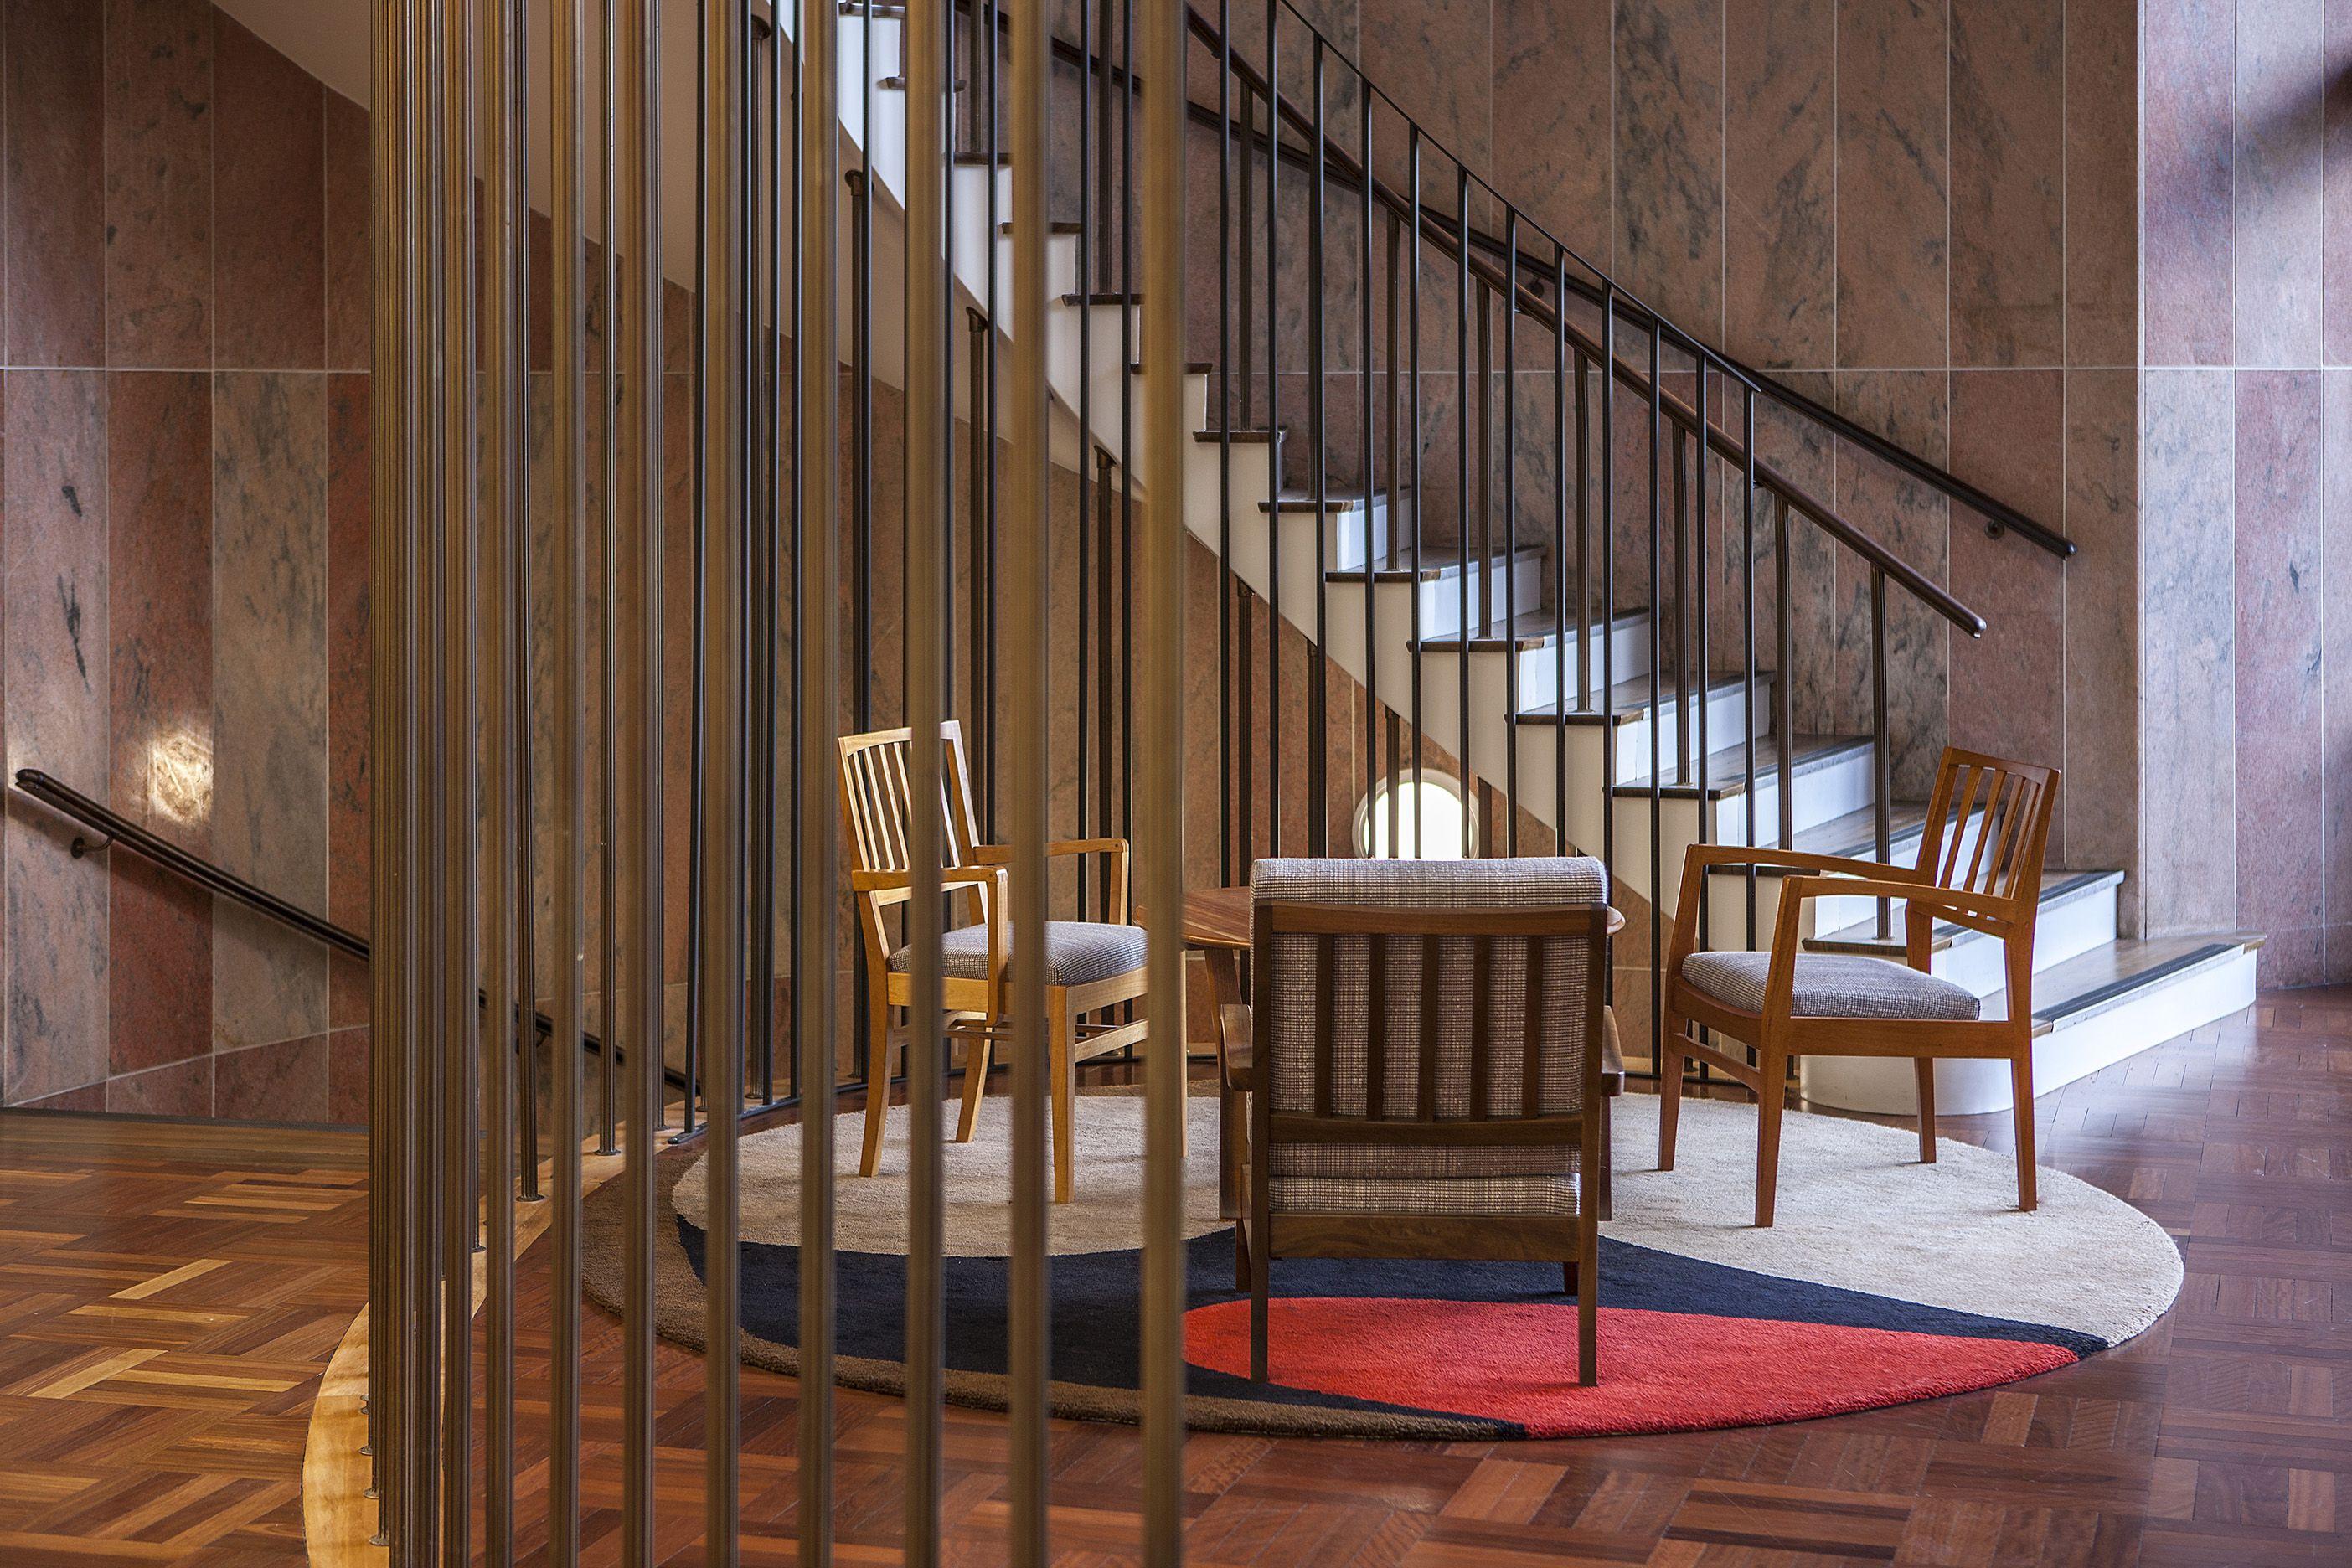 Heritage Commendation - J S Murdoch Award – ANU – Florey Building by CCJ Architects. Photo by Ben Wrigley.